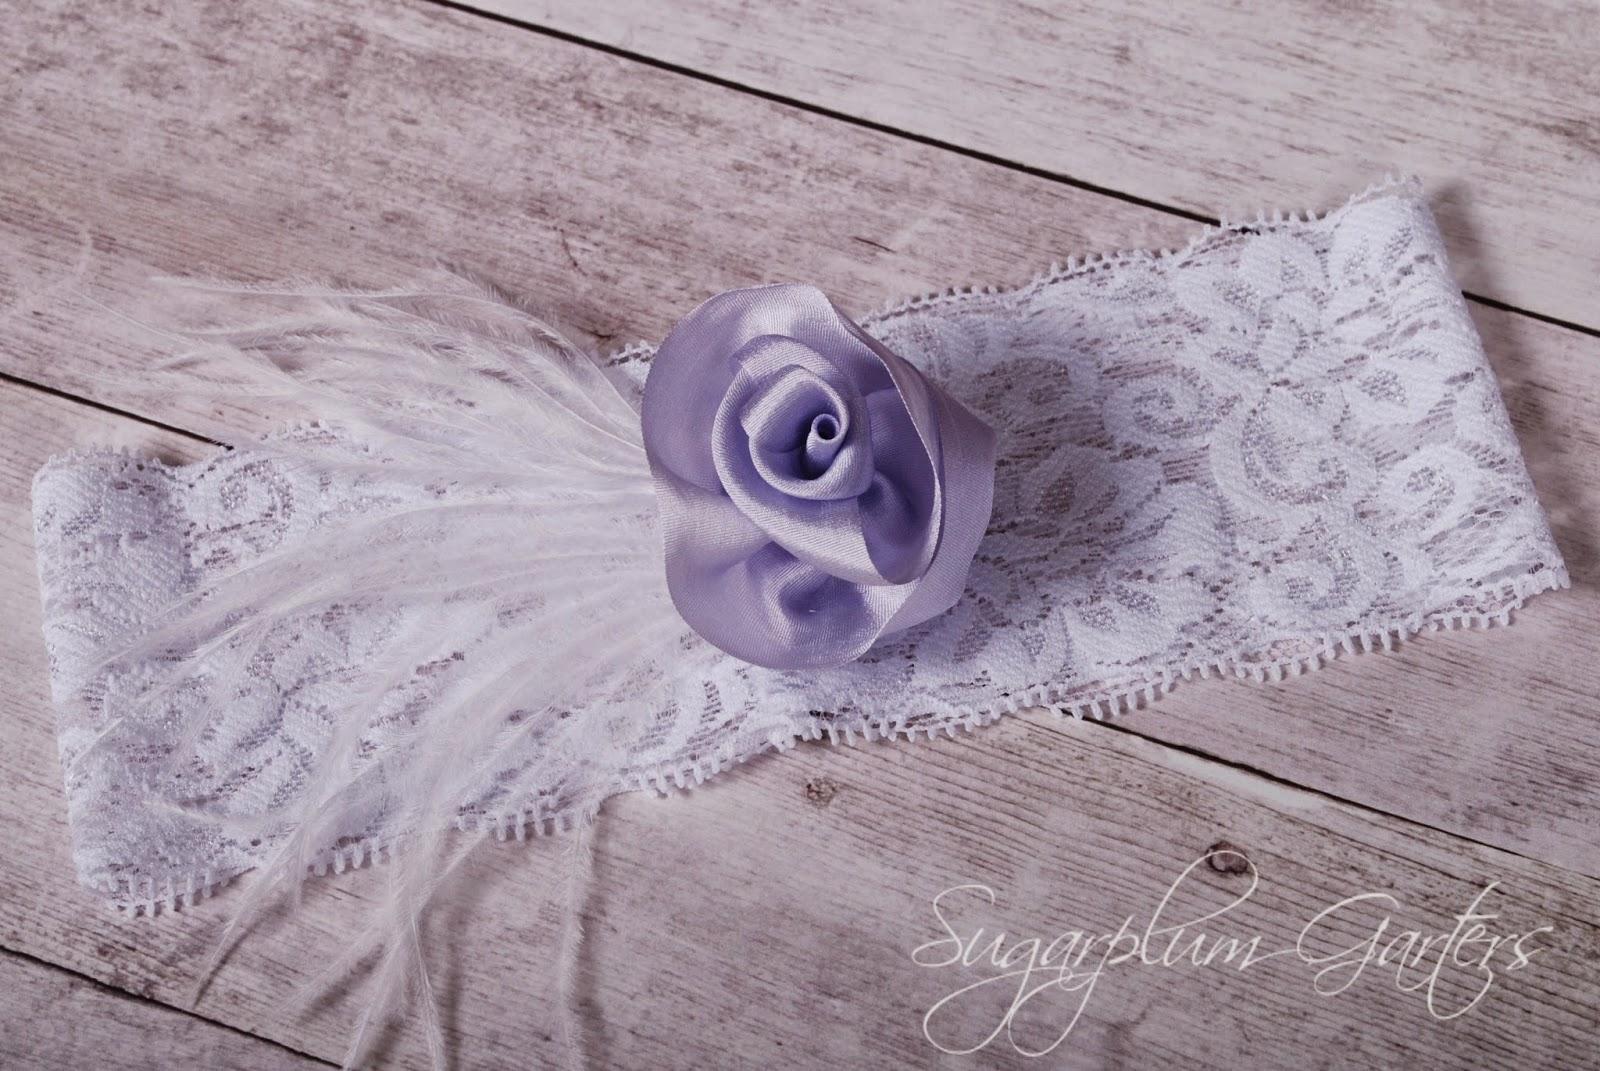 Wedding Garter in Lavender Silk and White Lace by Sugarplum Garters